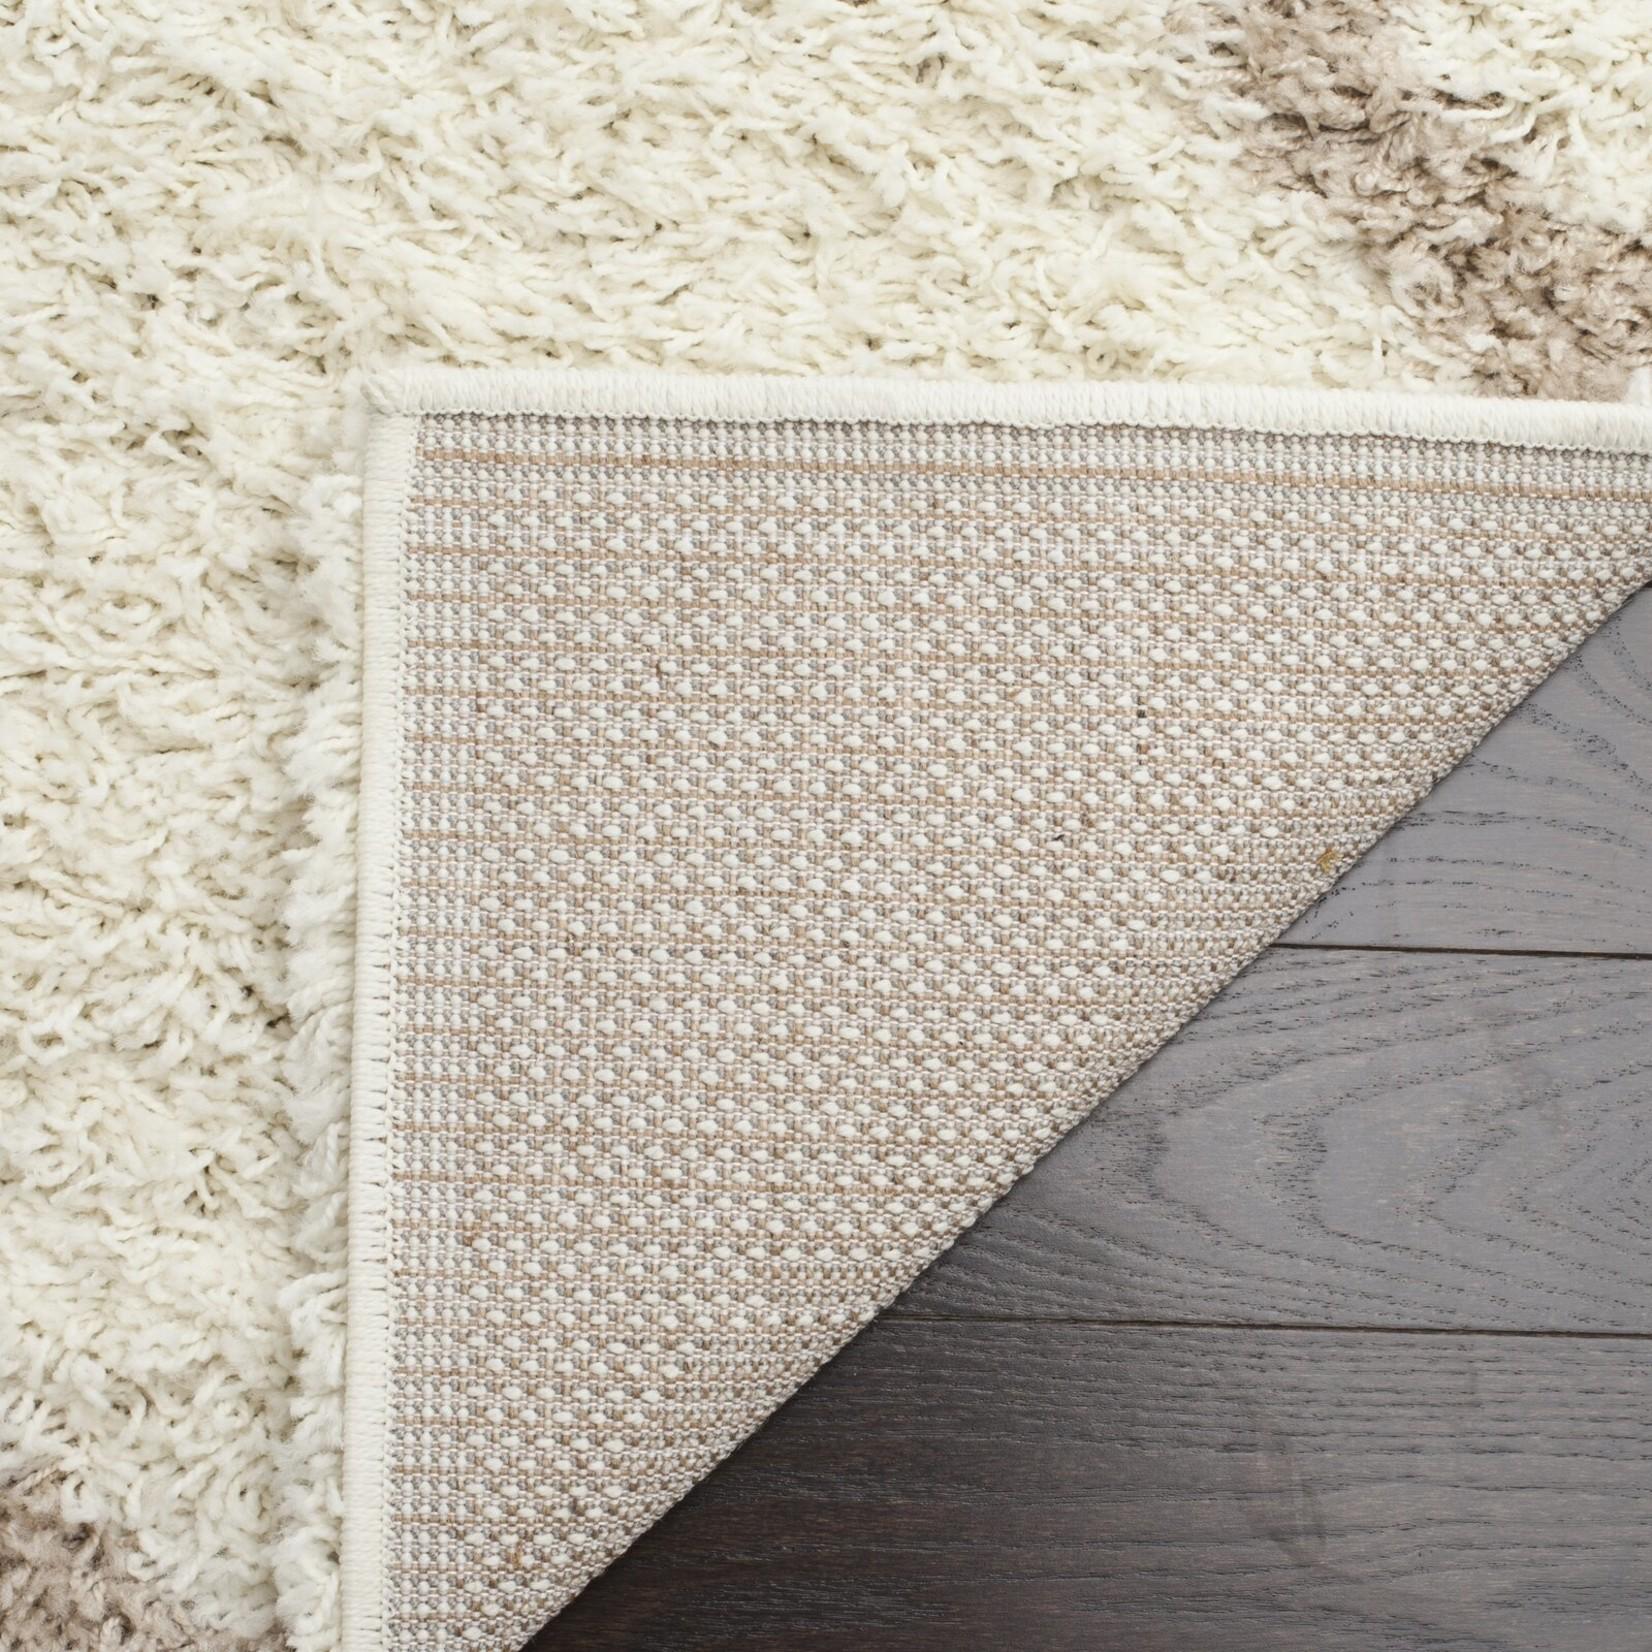 * 8' x 8' -  Lapidge Geometric Ivory/Beige Area Rug